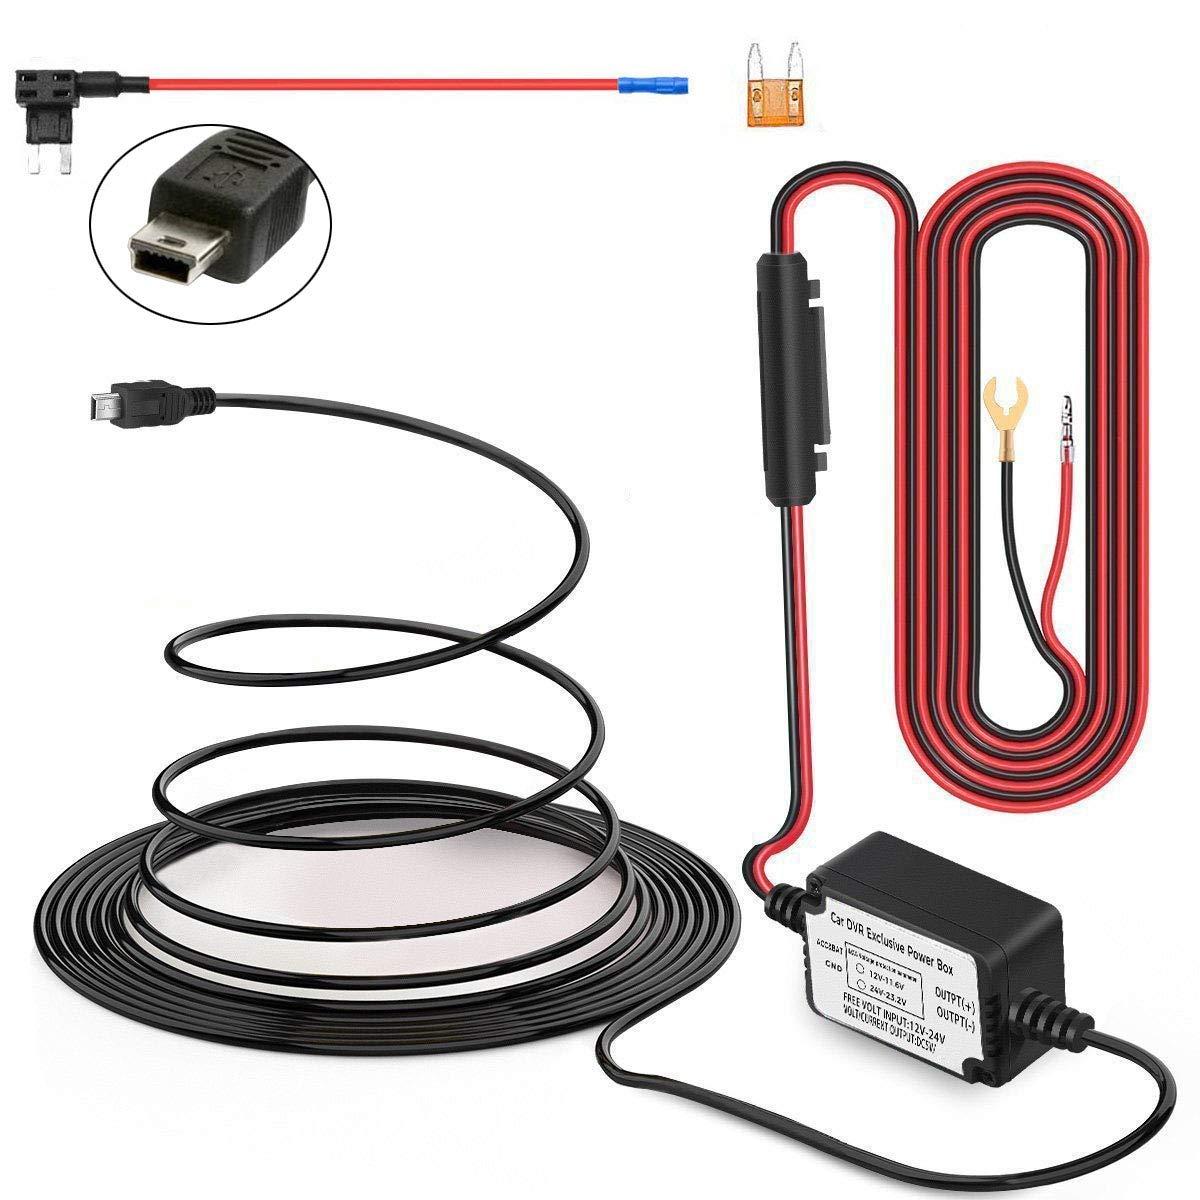 Inrigorous Auto-Kamera Hard Wire Kit mit Micro USB Direct Hardwire Kfz-Ladeger/ät Kabel Kit f/ür HD Pro und alle Micro-USB-Dashboard Kamera Netzteil KFZ-Ladeger/ät GPS Auto-DVR Power Box